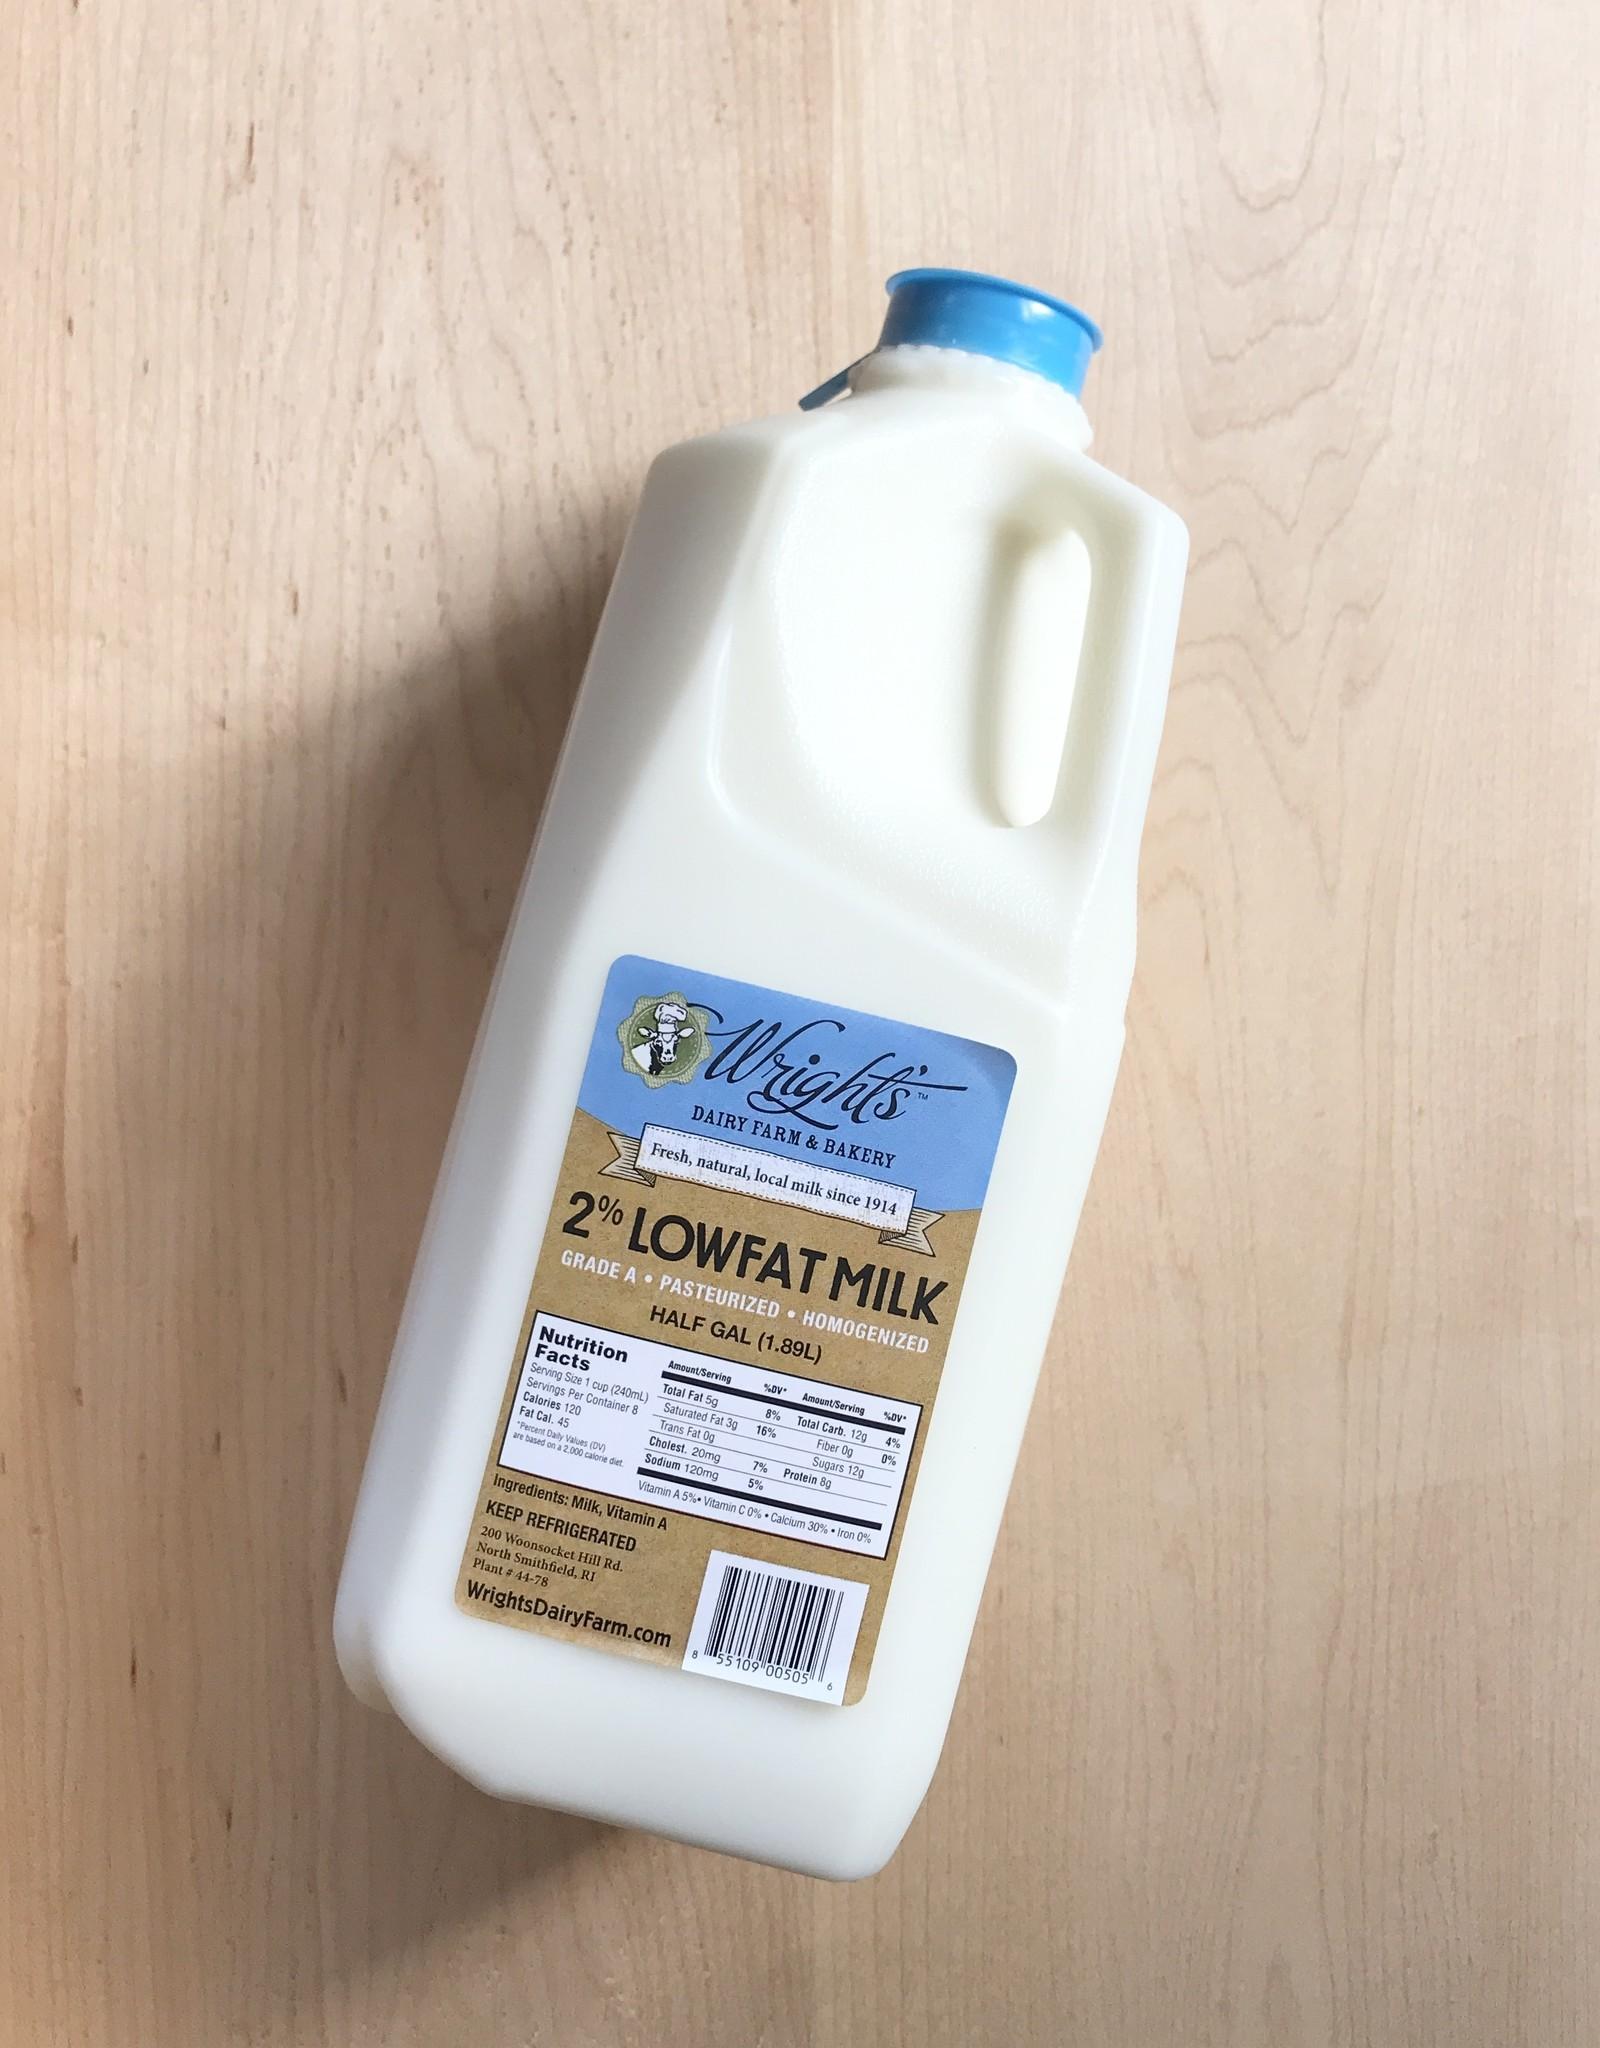 Wright's Dairy Farm Wright's Dairy Milk Half Gallon